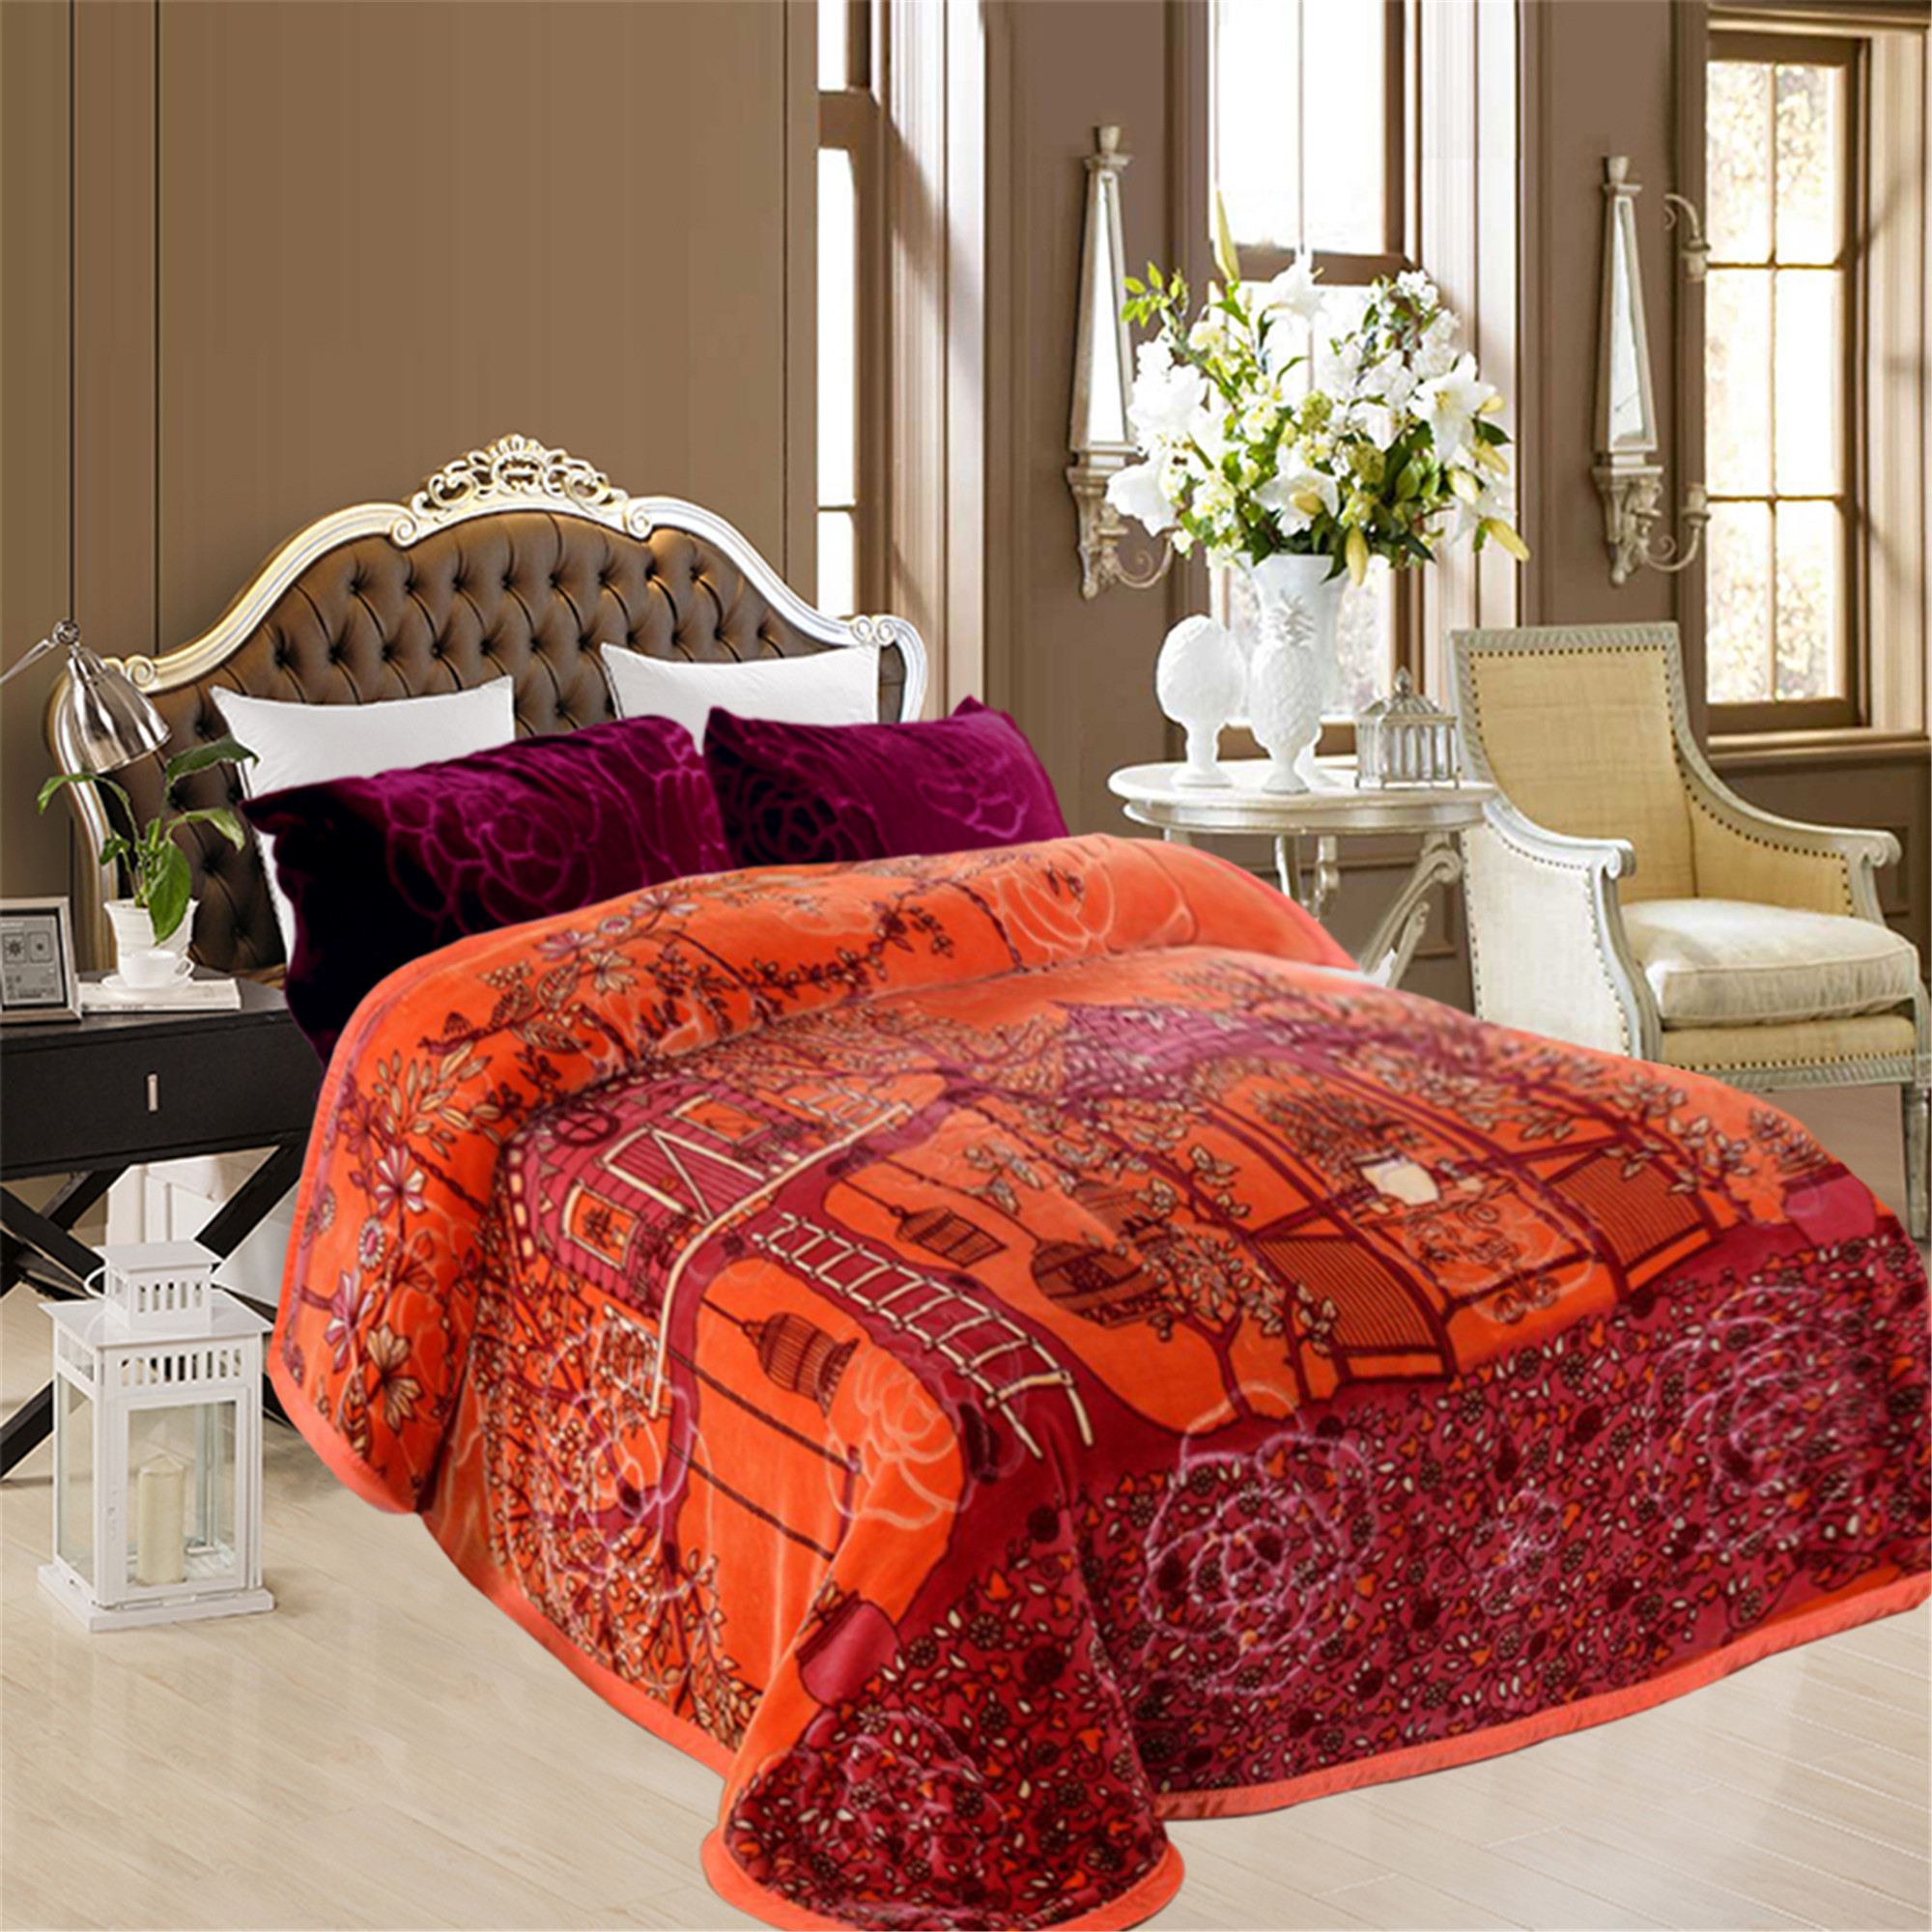 "Super Soft Plush Mink Bed Blanket 2 Ply Printed Fleece Blanket Queen 76""x85"""